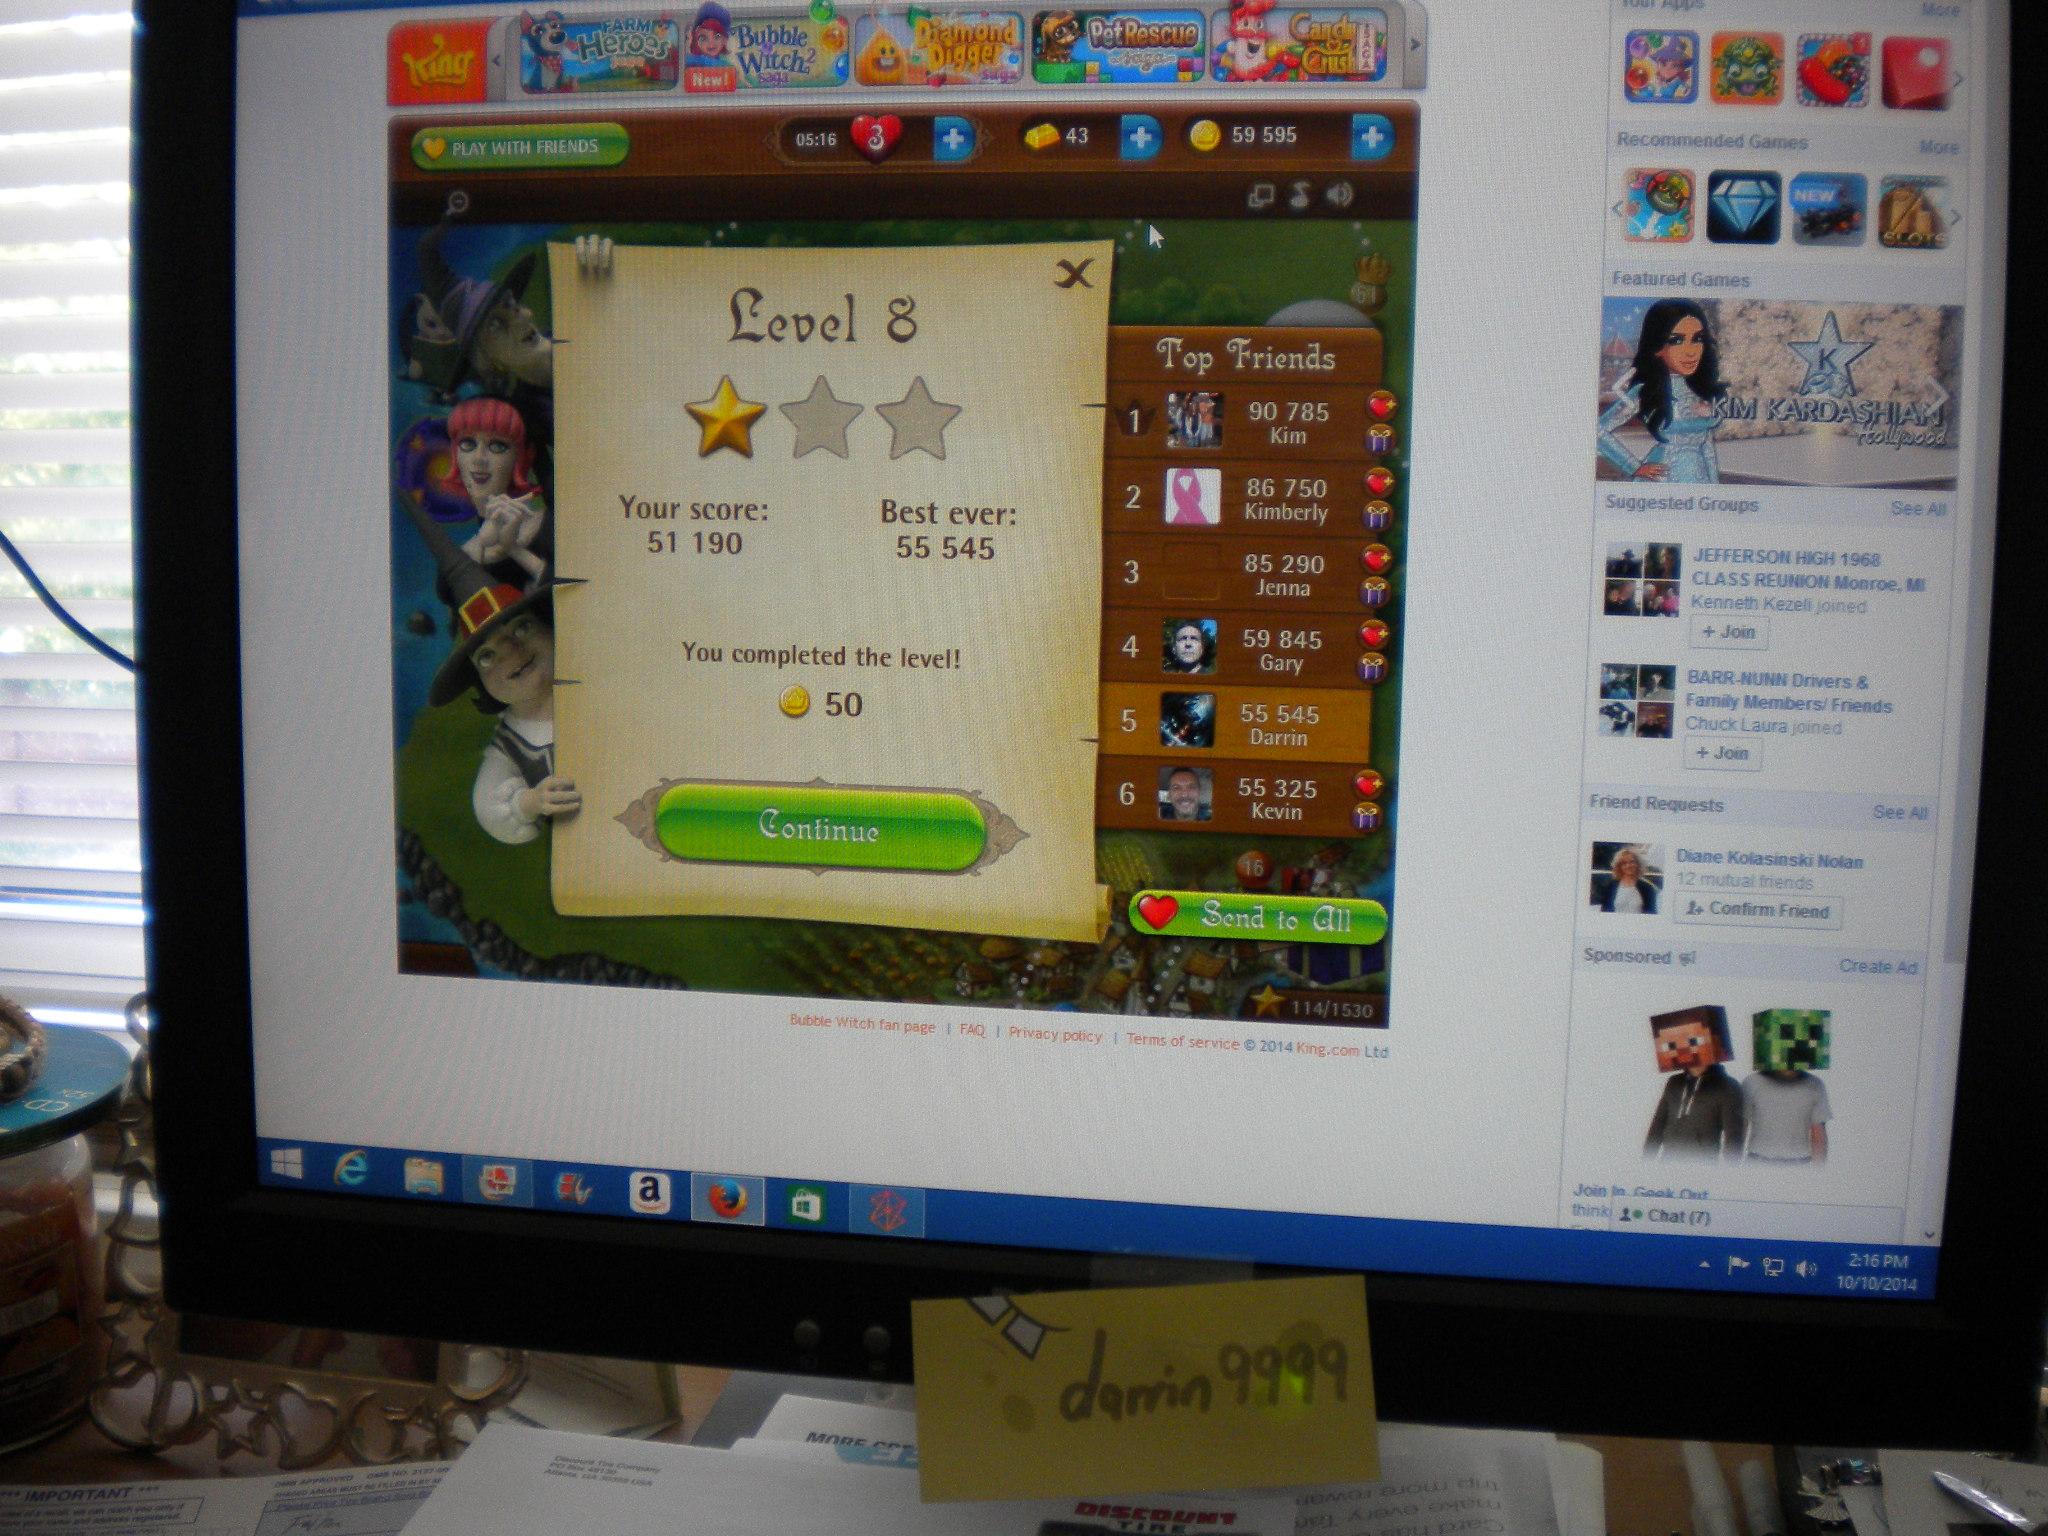 Bubble Witch Saga: Level 8 55,545 points